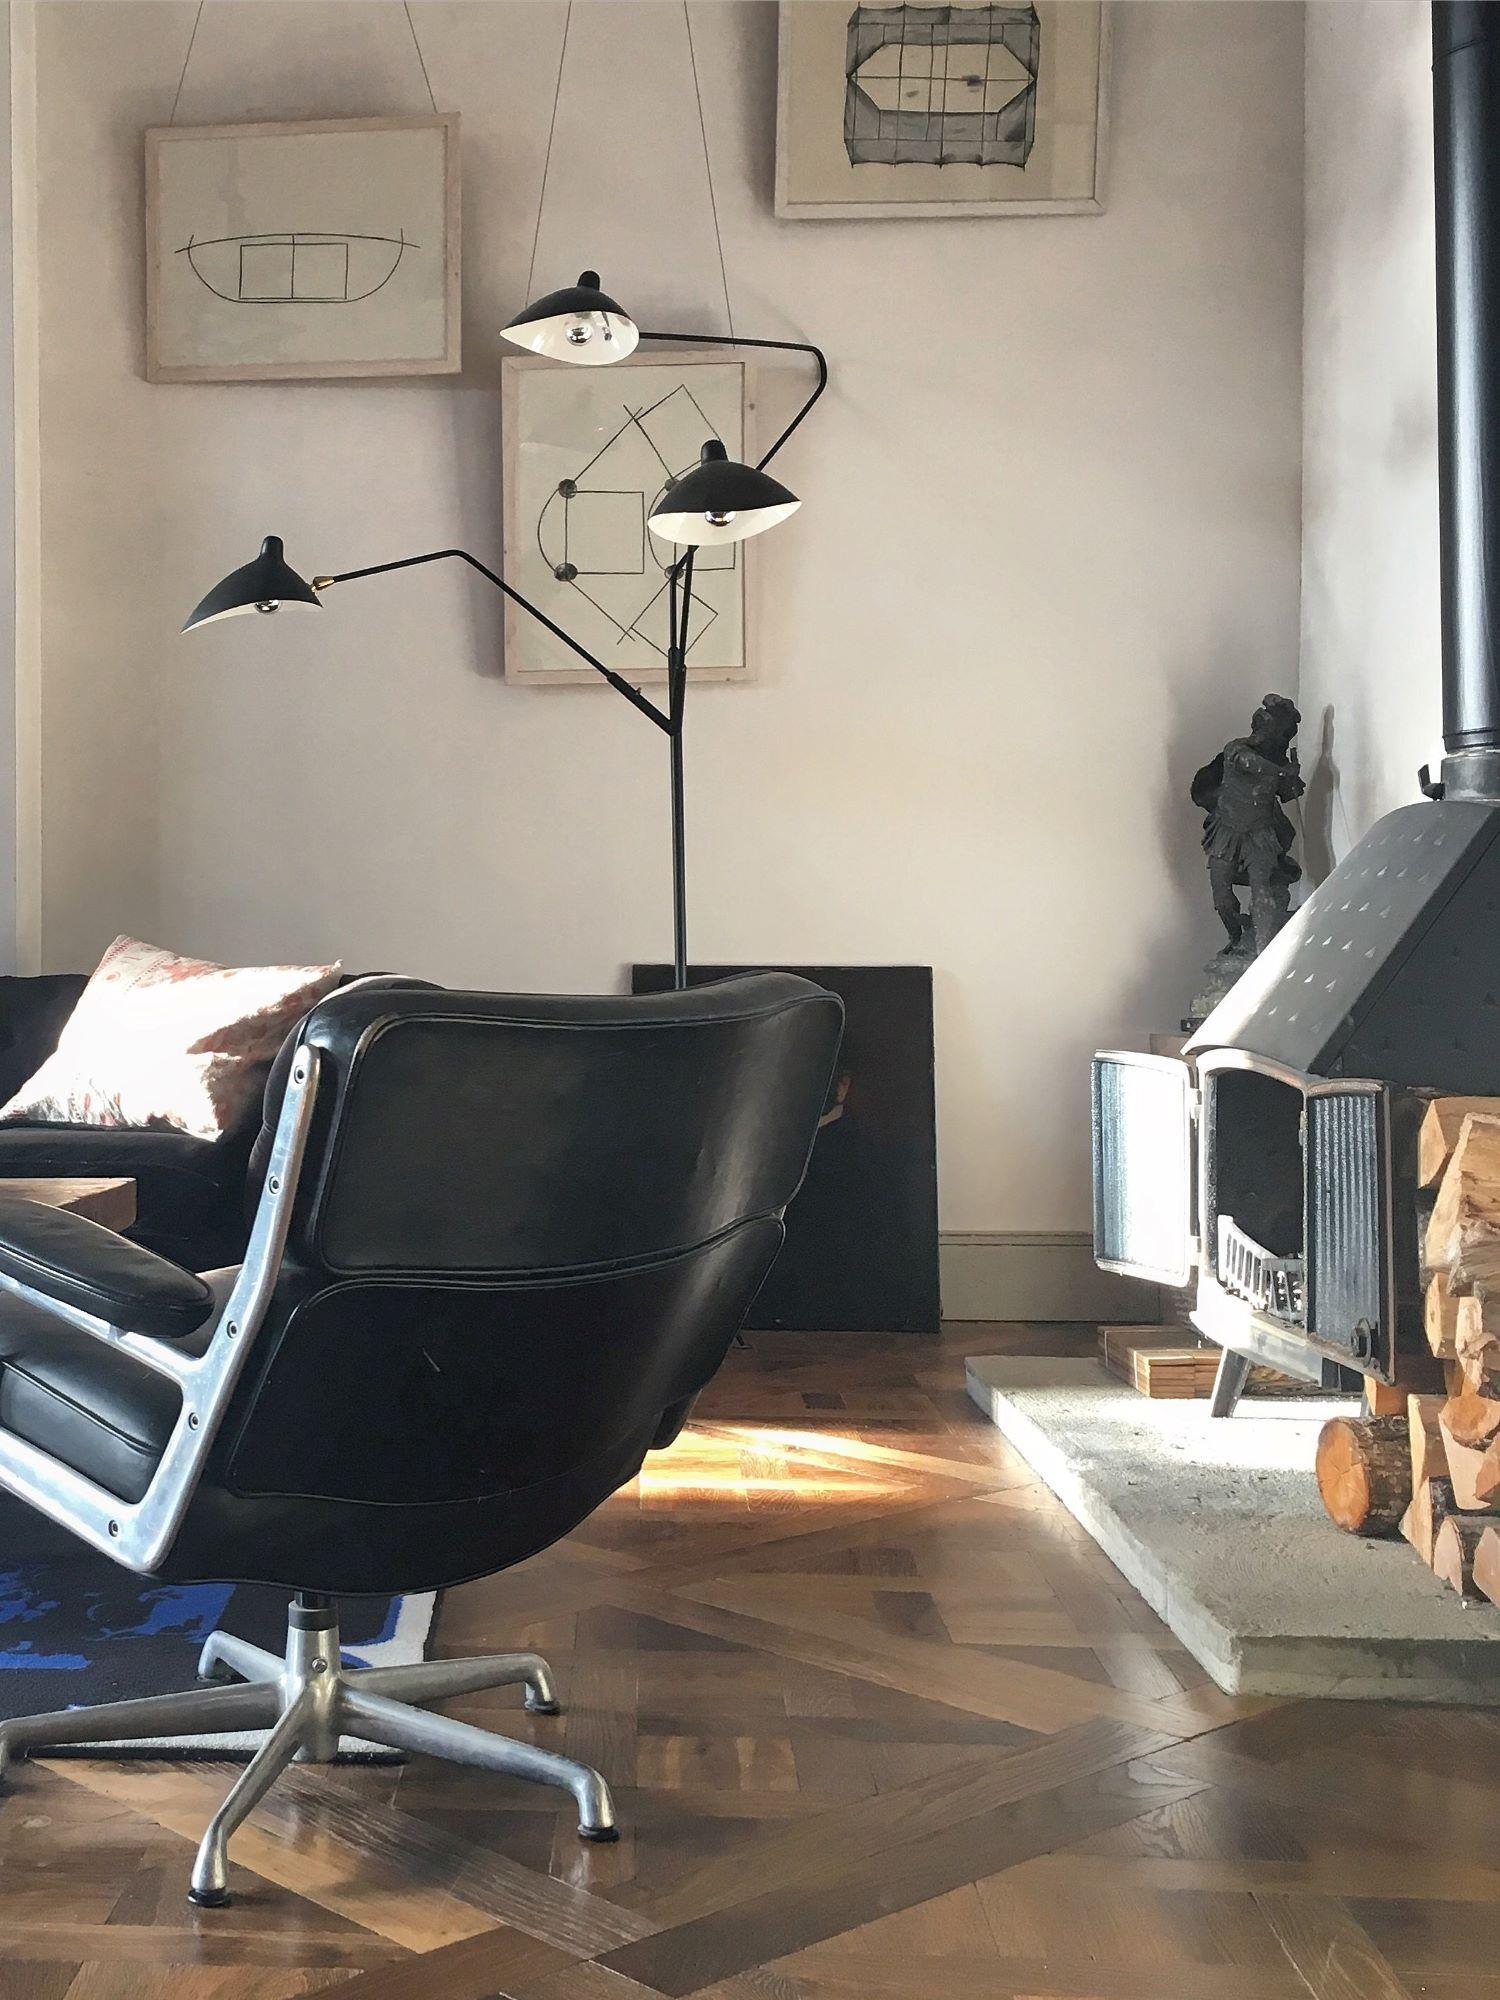 Oak landmark tatton versailles panel with leather sofas and tri-pod light